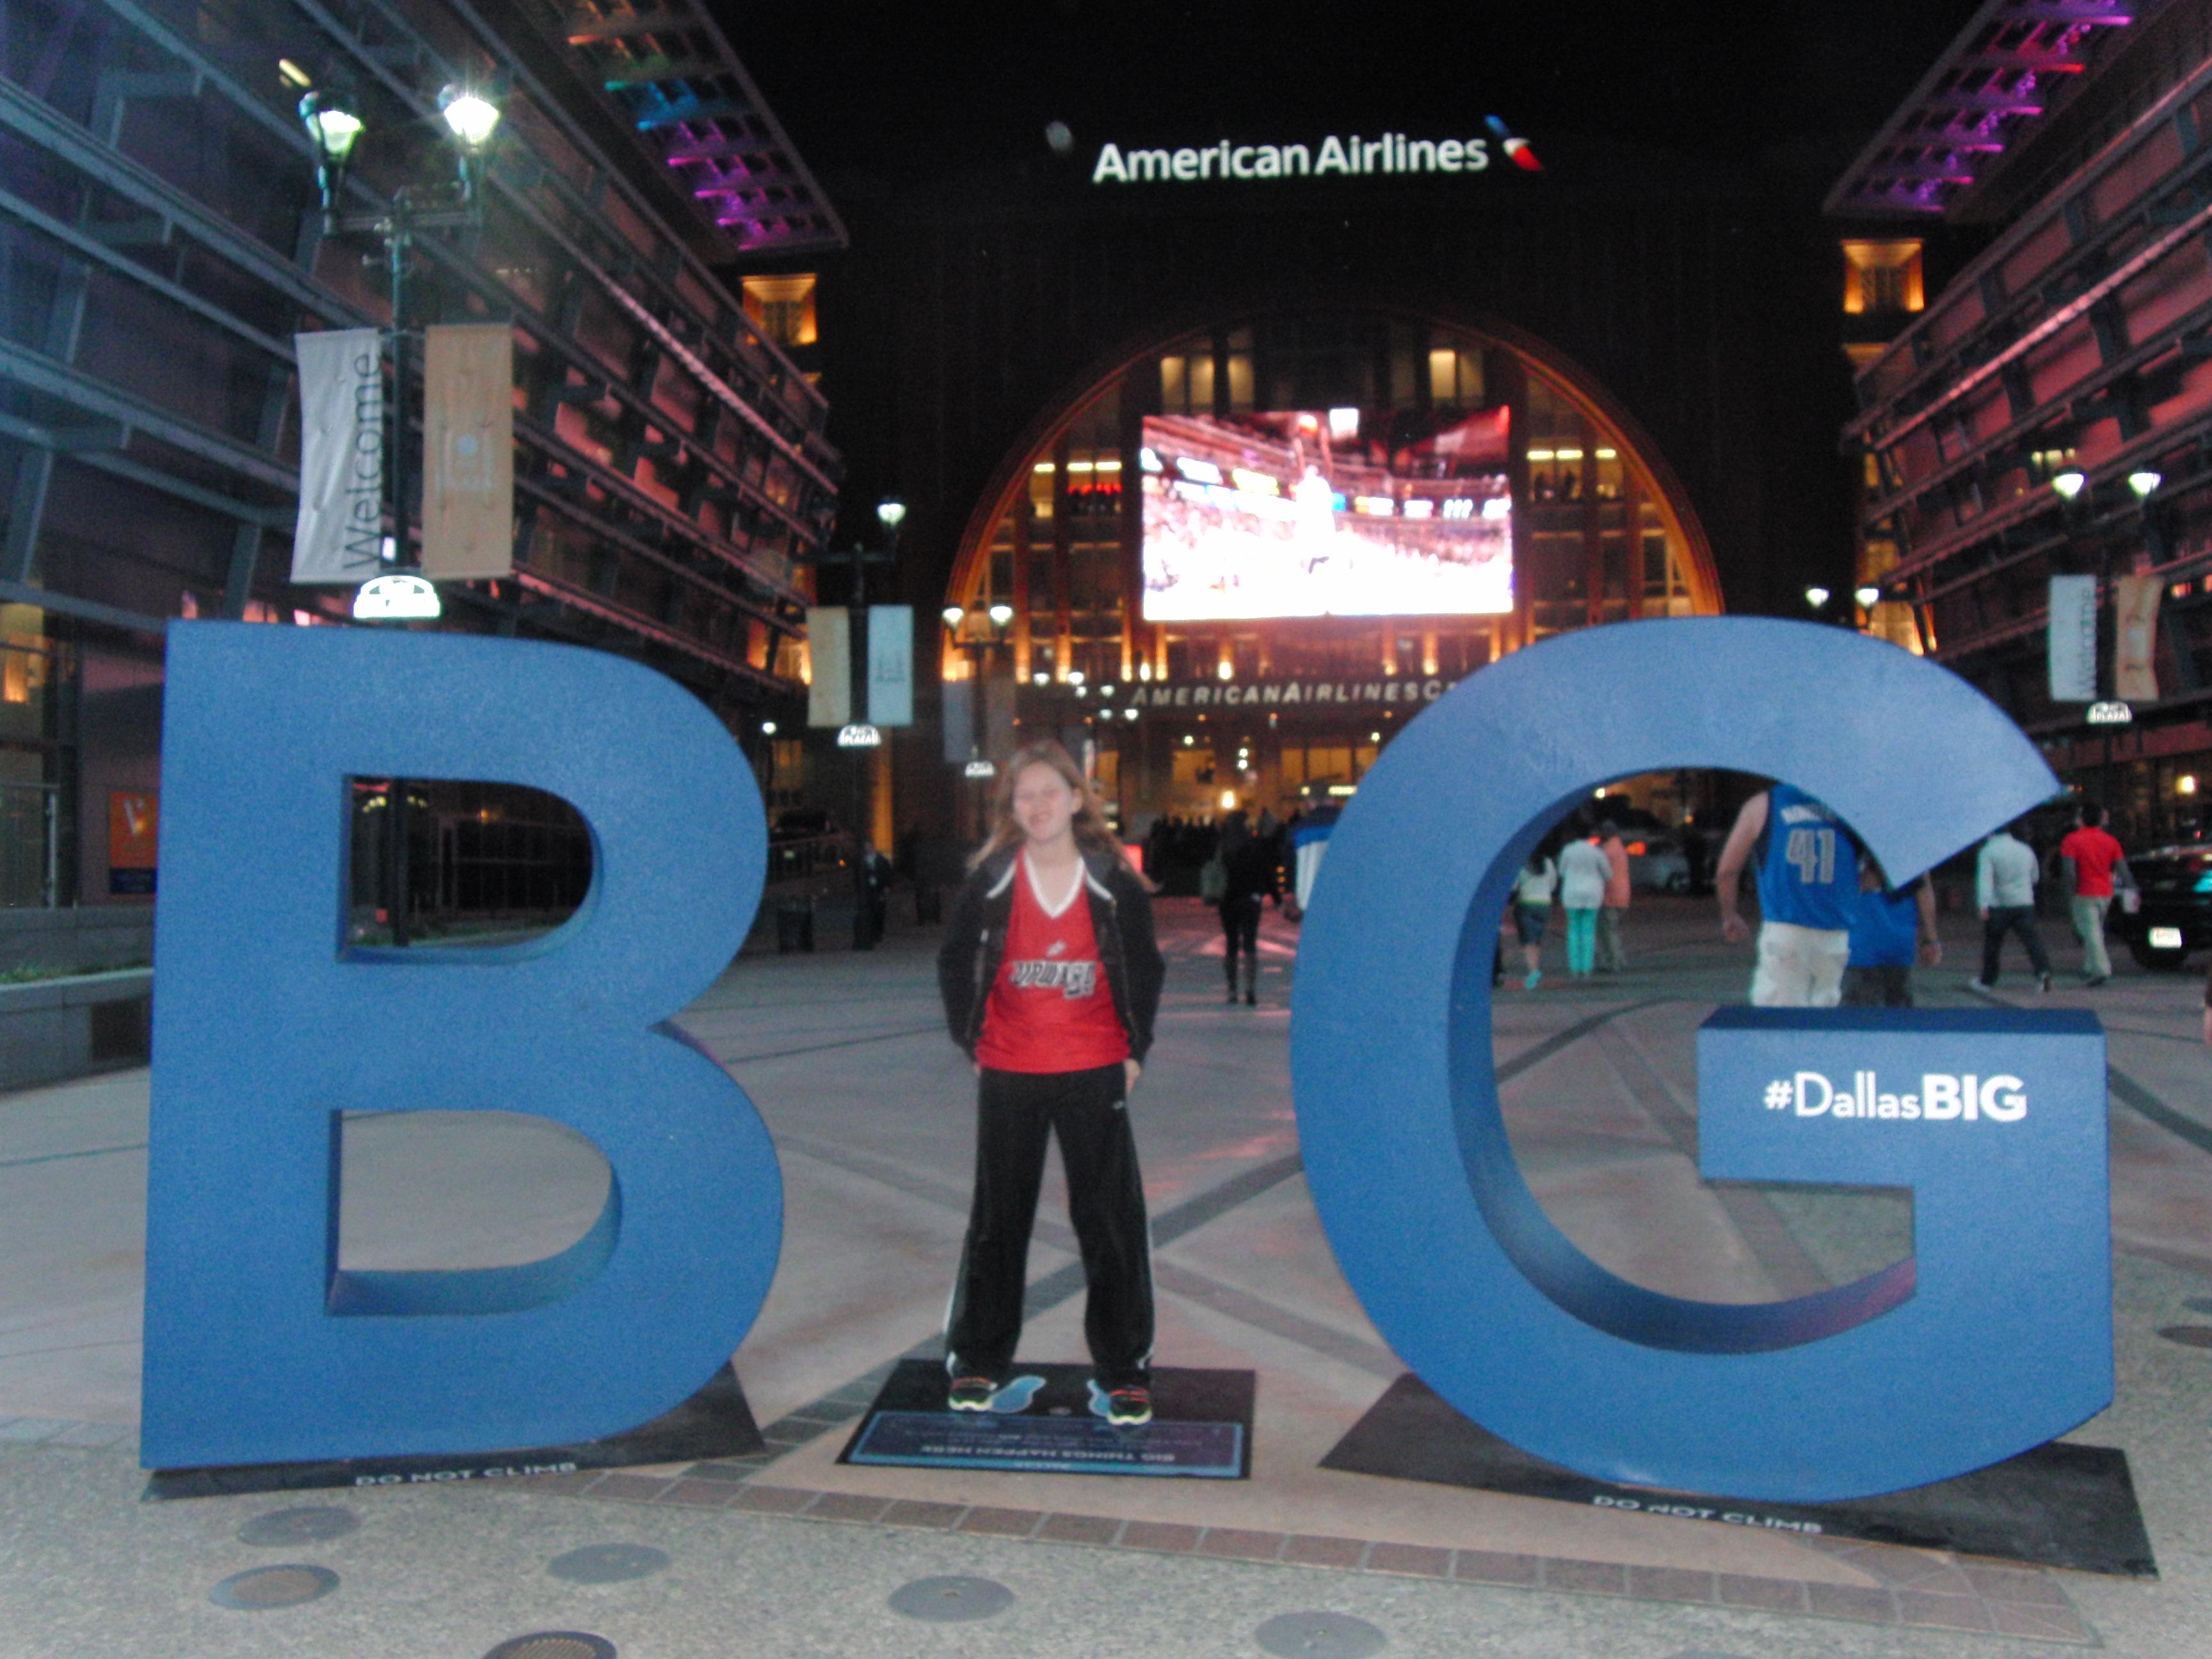 Dallas Mavericks Game At American Airlines Center